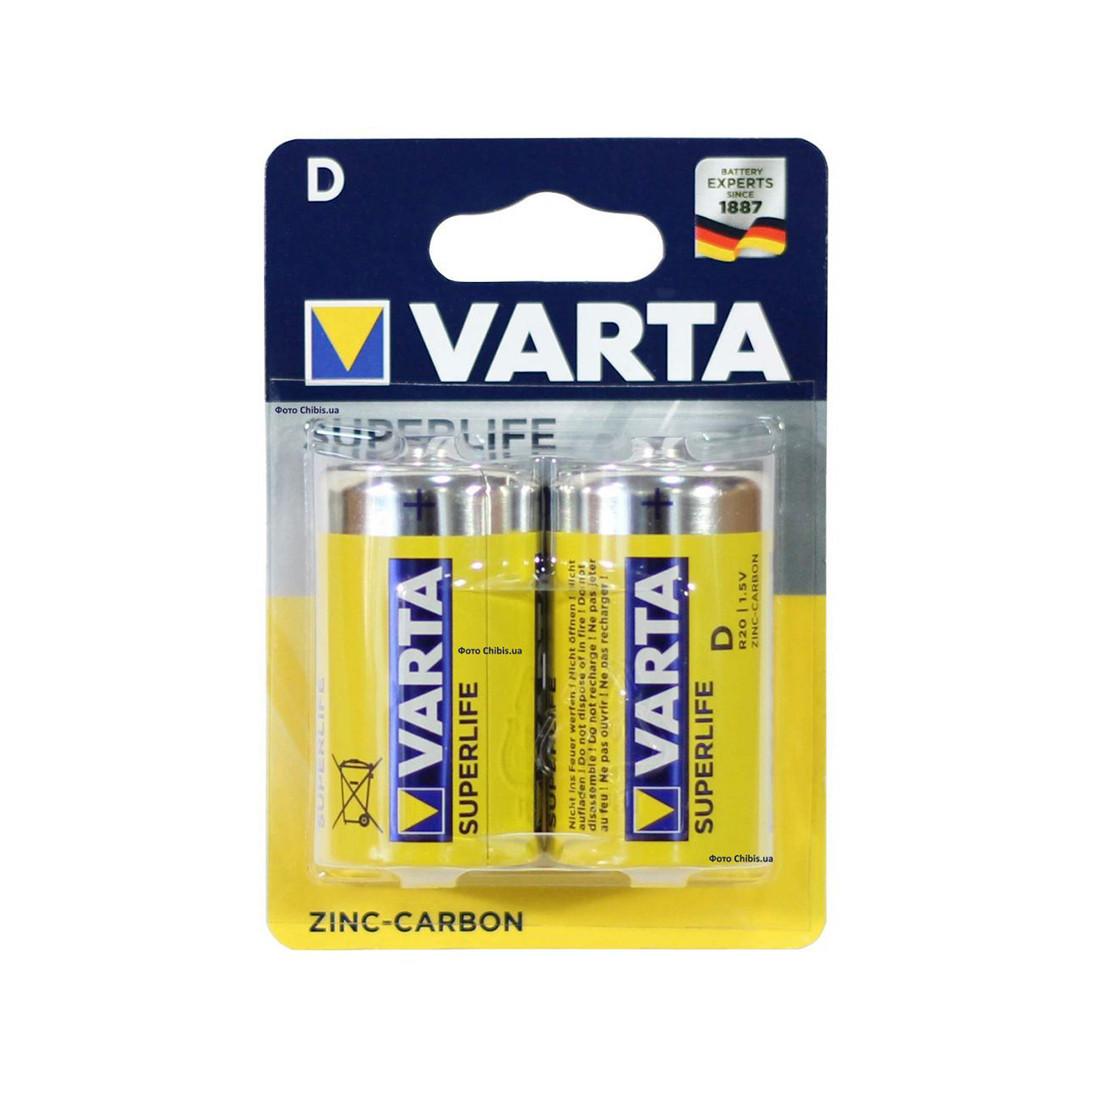 Батарейка VARTA Superlife Mono 1.5V - R20P/D (2 шт) в пленке (2014)